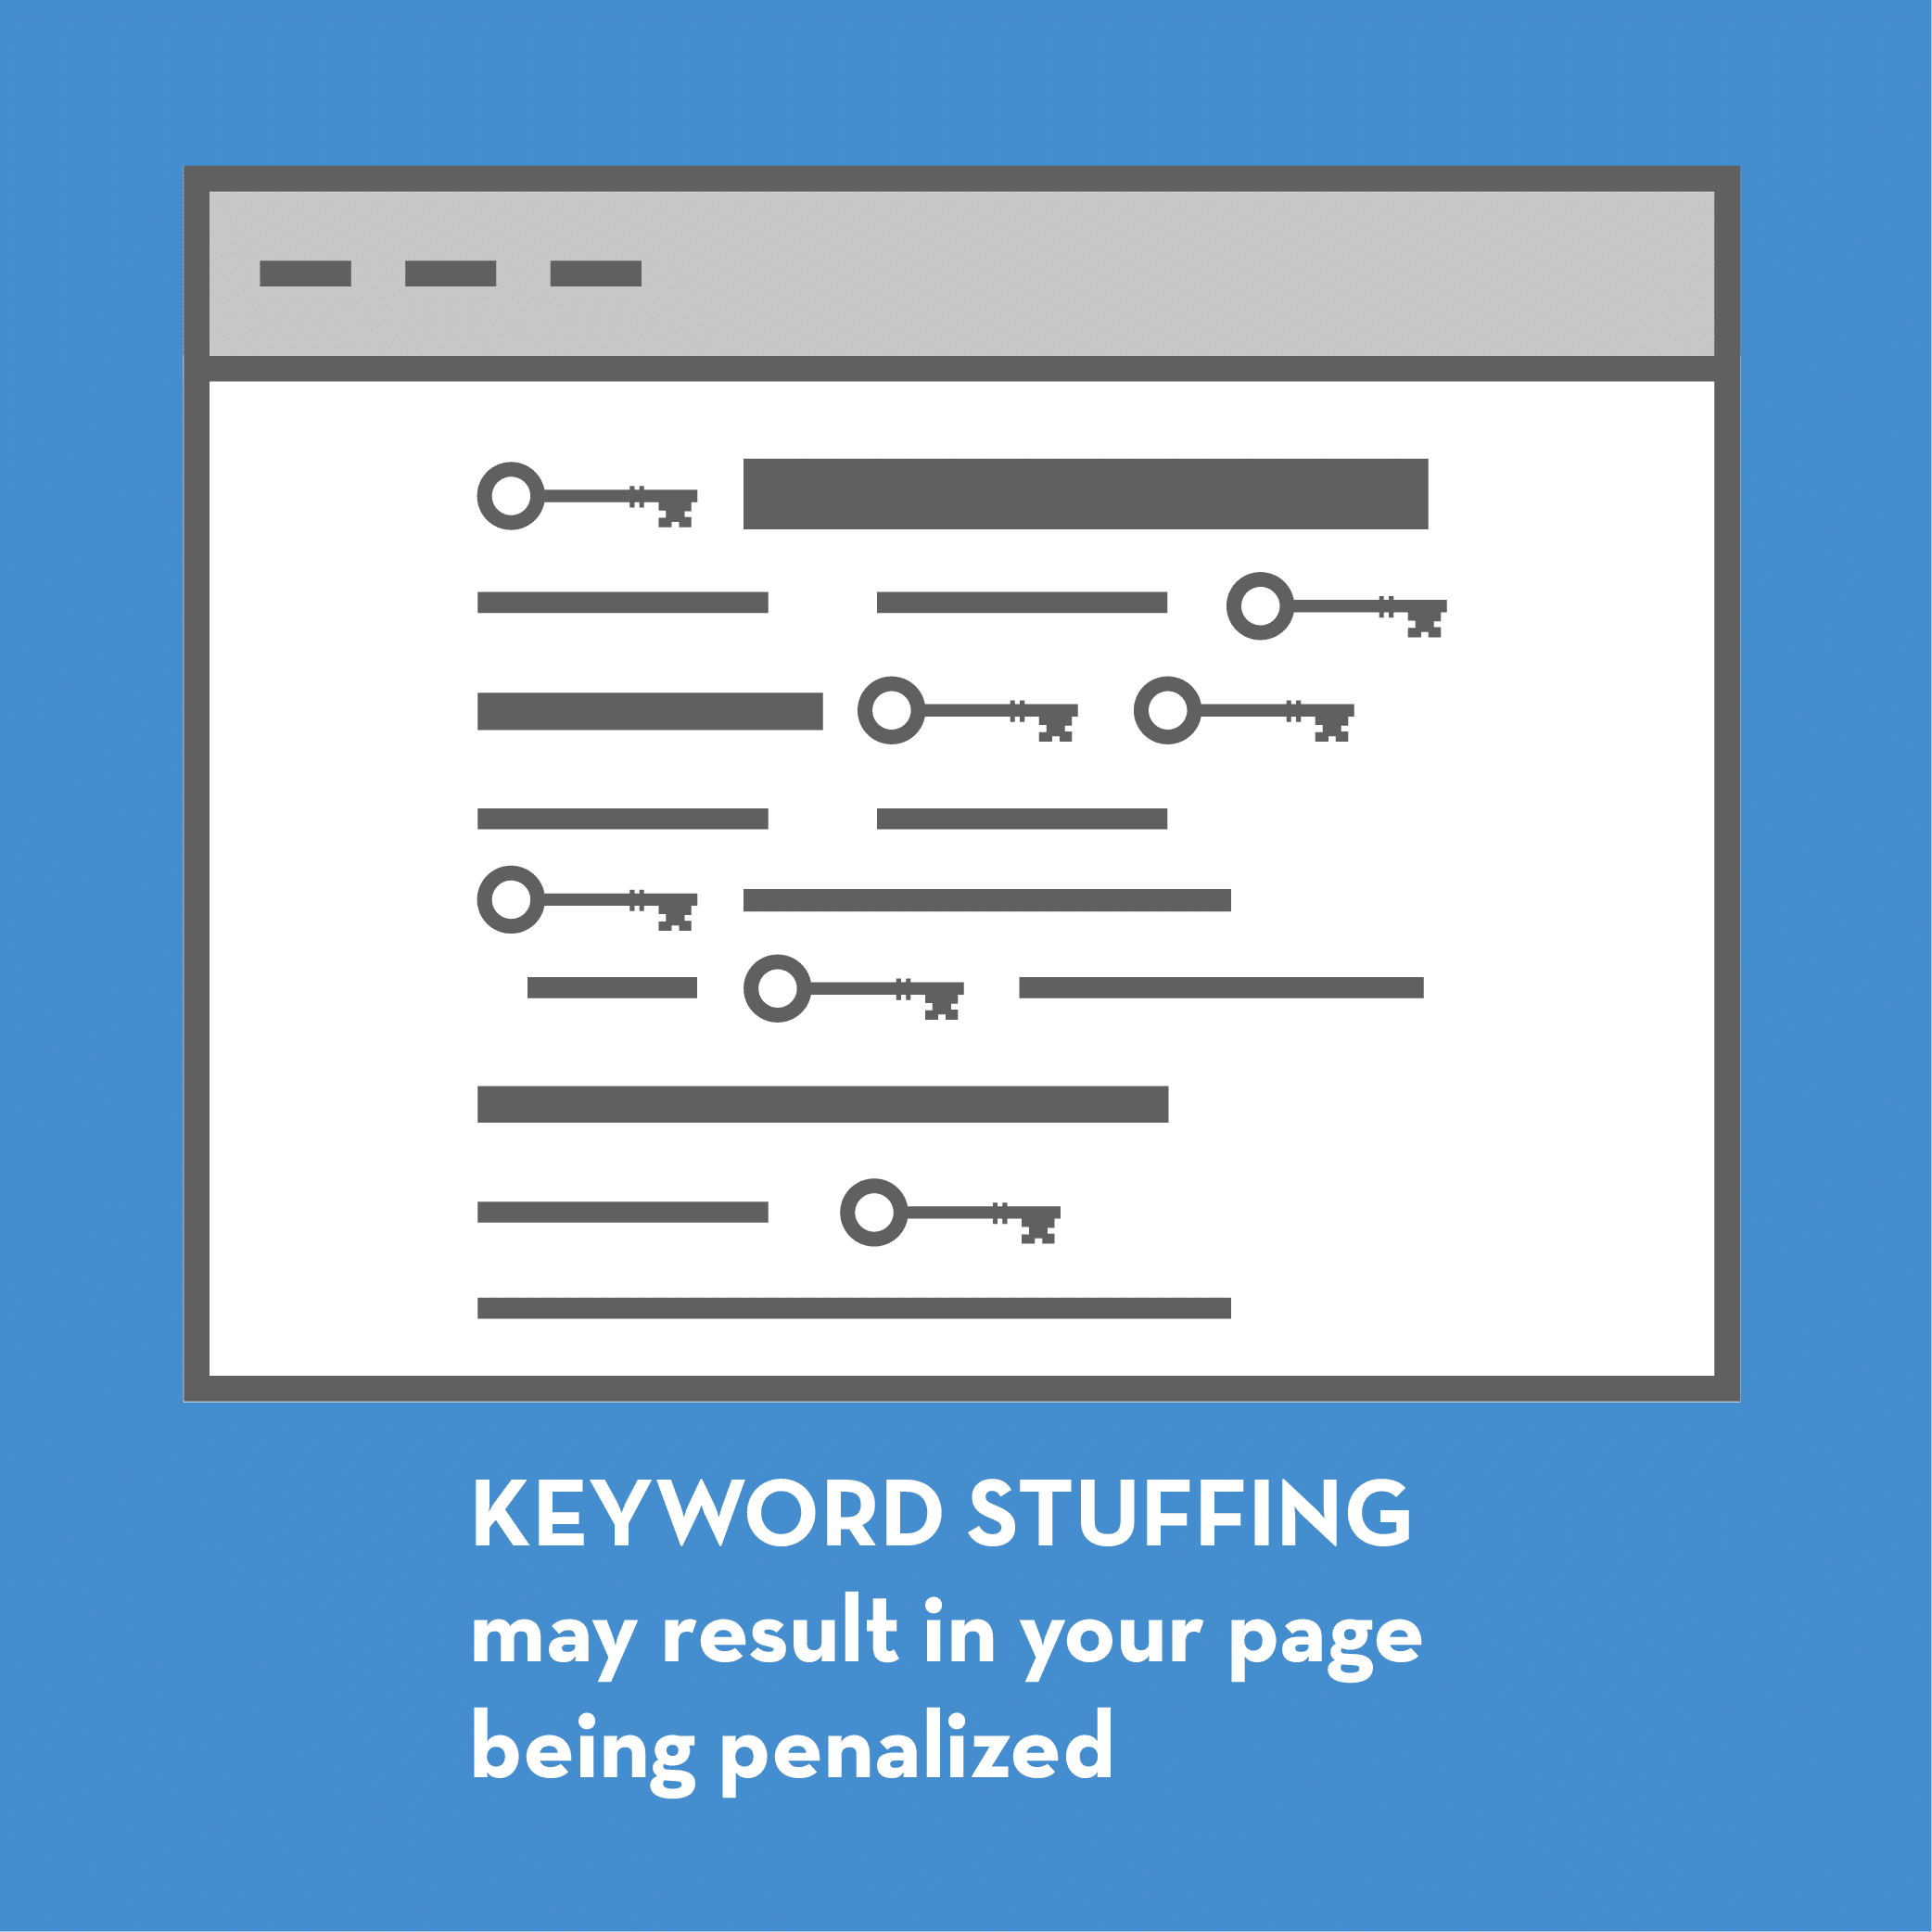 Illustration explaining the issues with keyword stuffing.